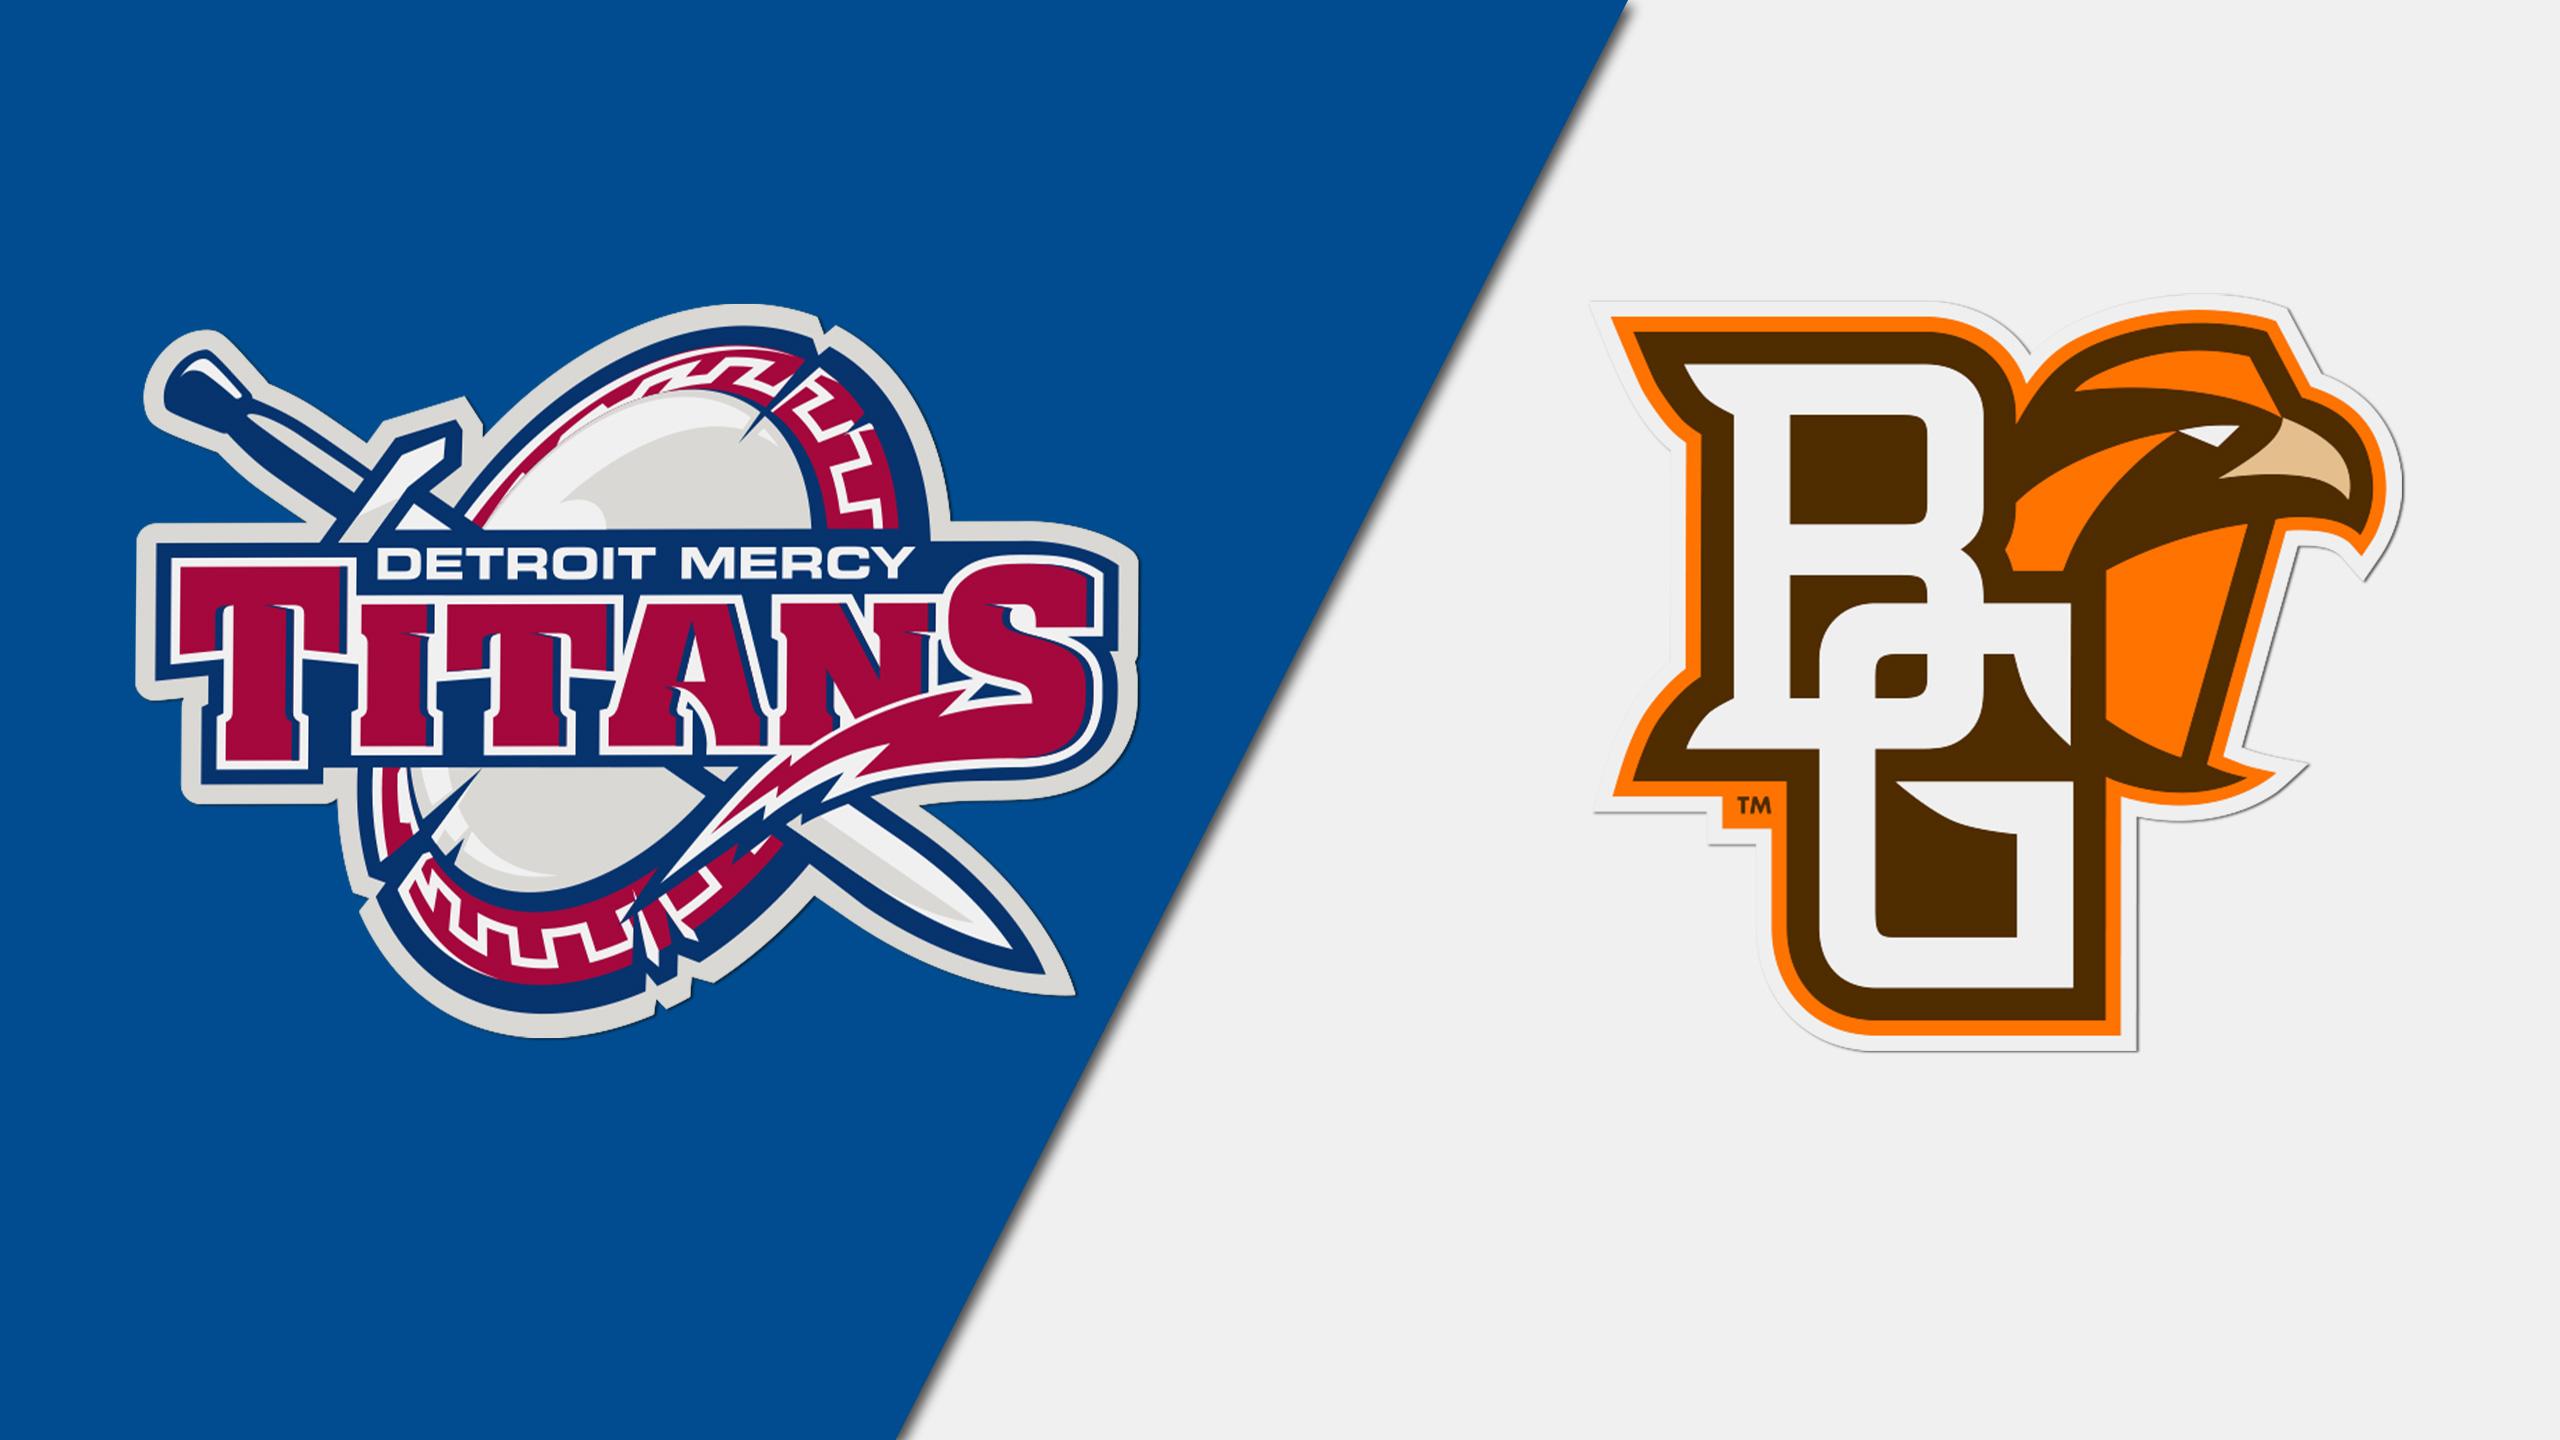 Detroit Mercy vs. Bowling Green (W Basketball)